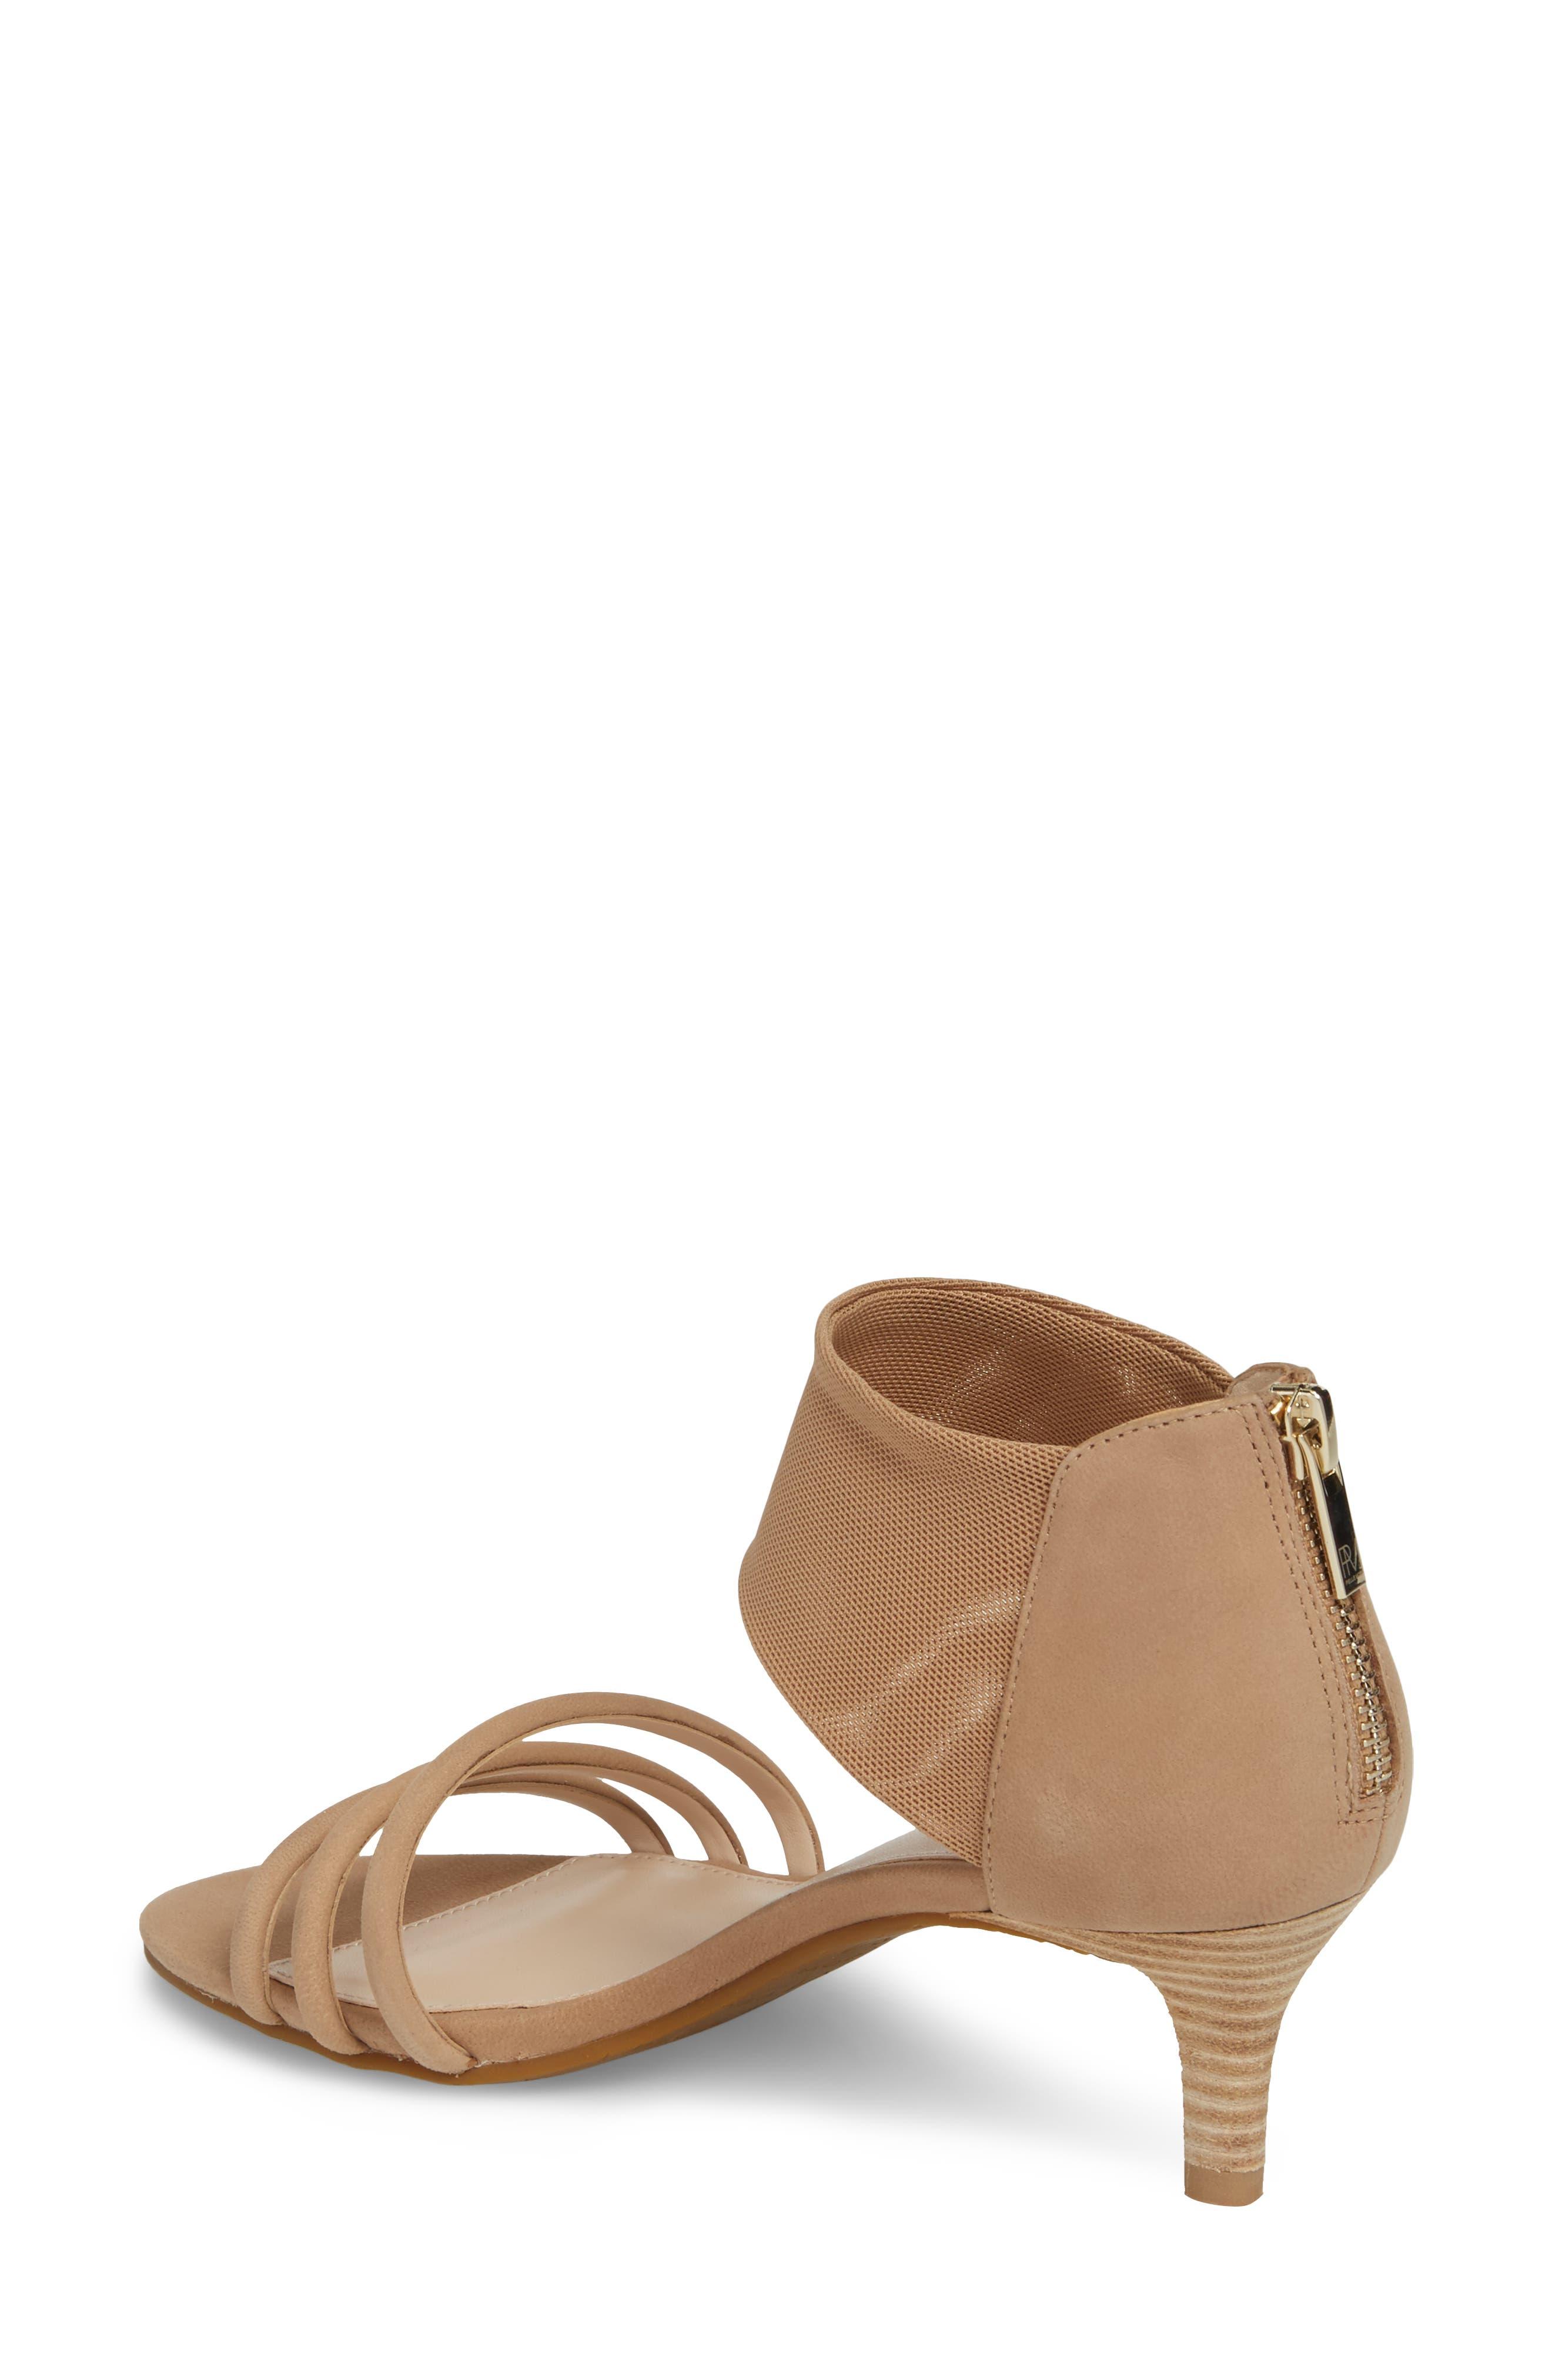 Berri Ankle Cuff Sandal,                             Alternate thumbnail 5, color,